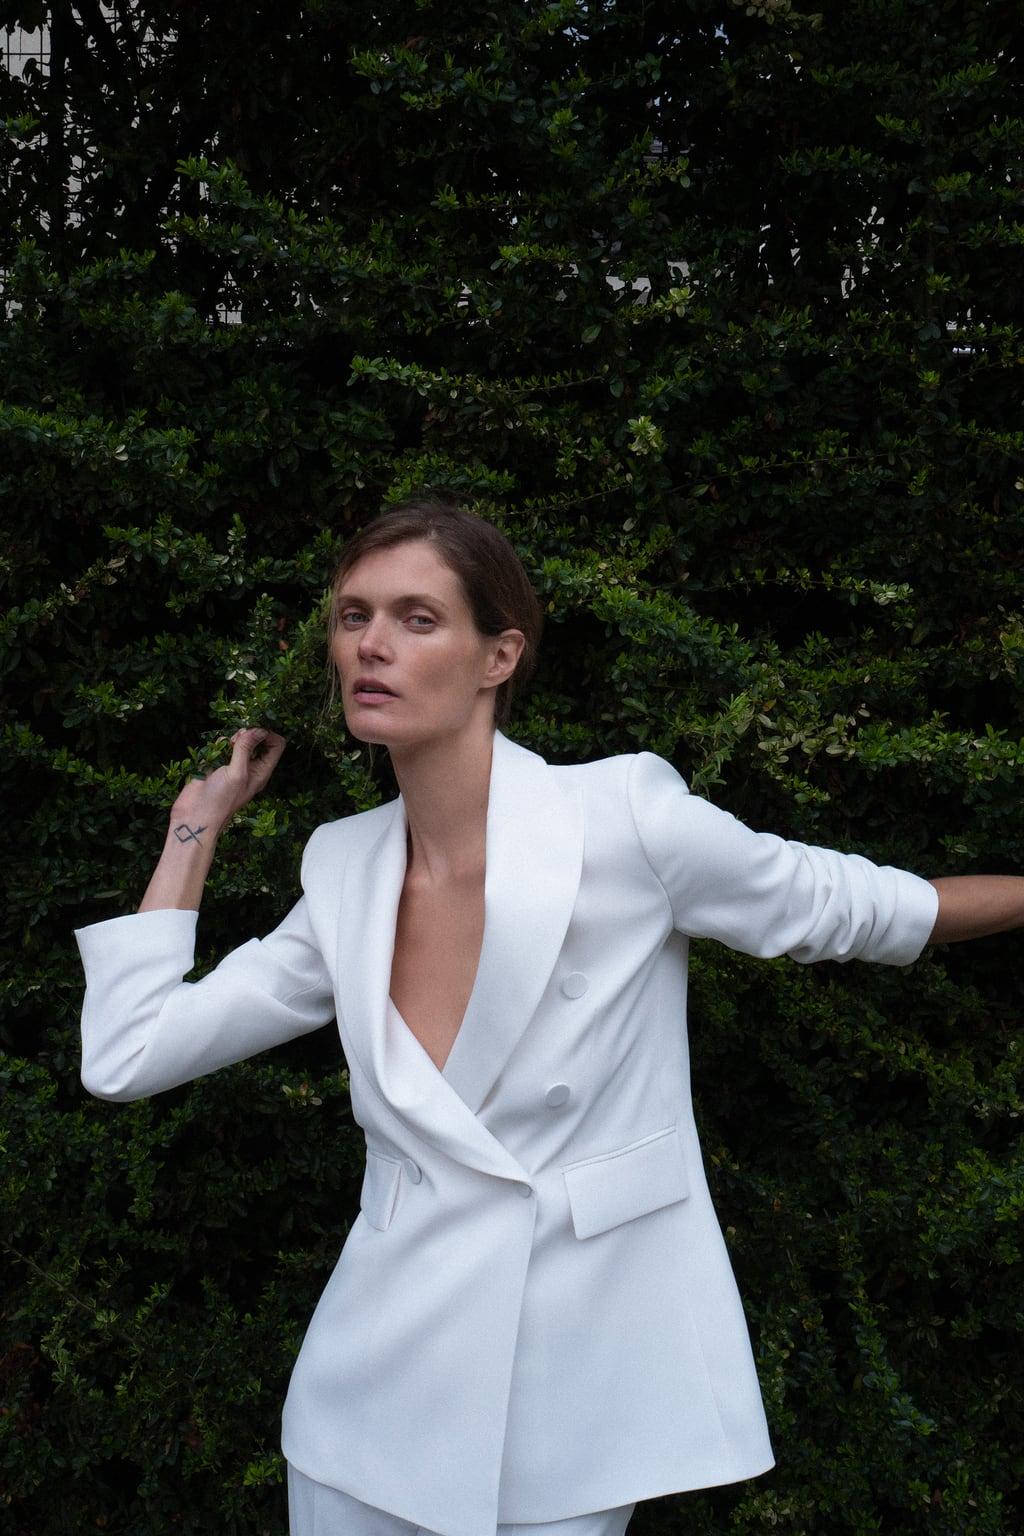 a21fc815d6e4 Shoptagr | Tuxedo Jacket Collection Timeless Woman Corner Shops by Zara